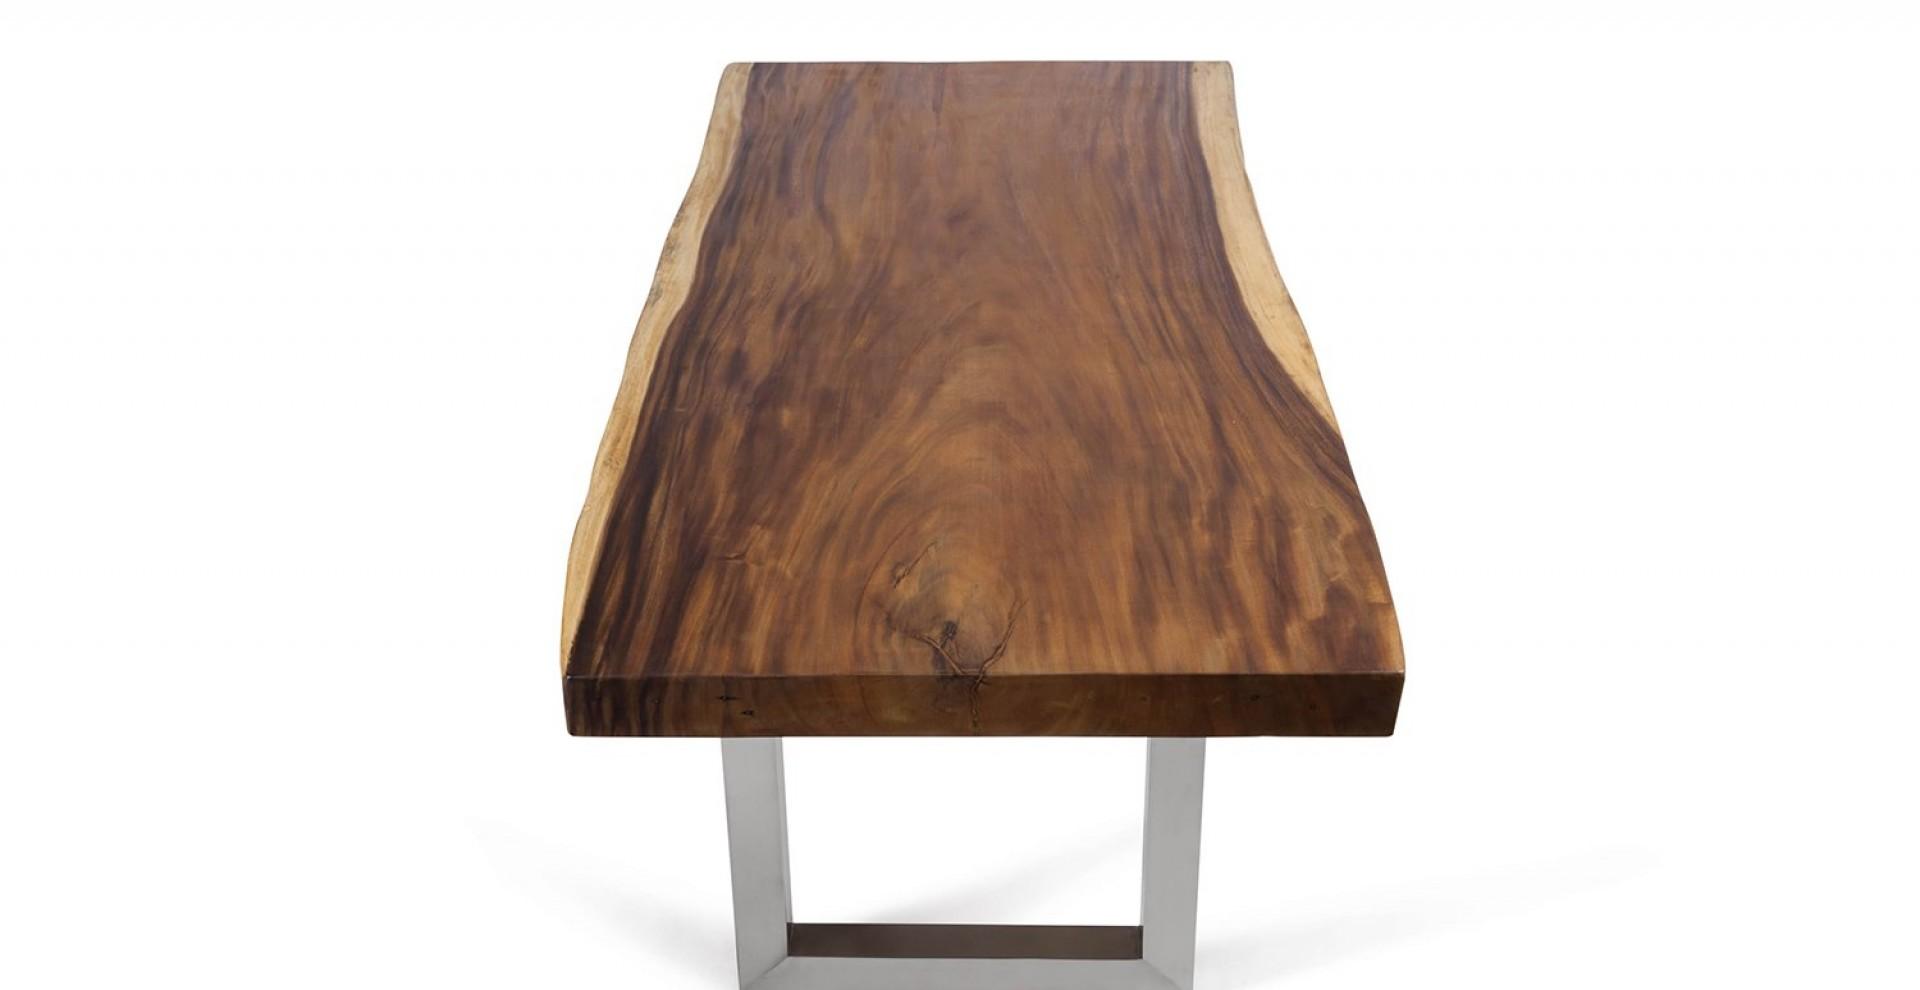 holzplatte aus baumstamm der tischonkel couchtisch tischplatte aus einem massivem couchtisch. Black Bedroom Furniture Sets. Home Design Ideas